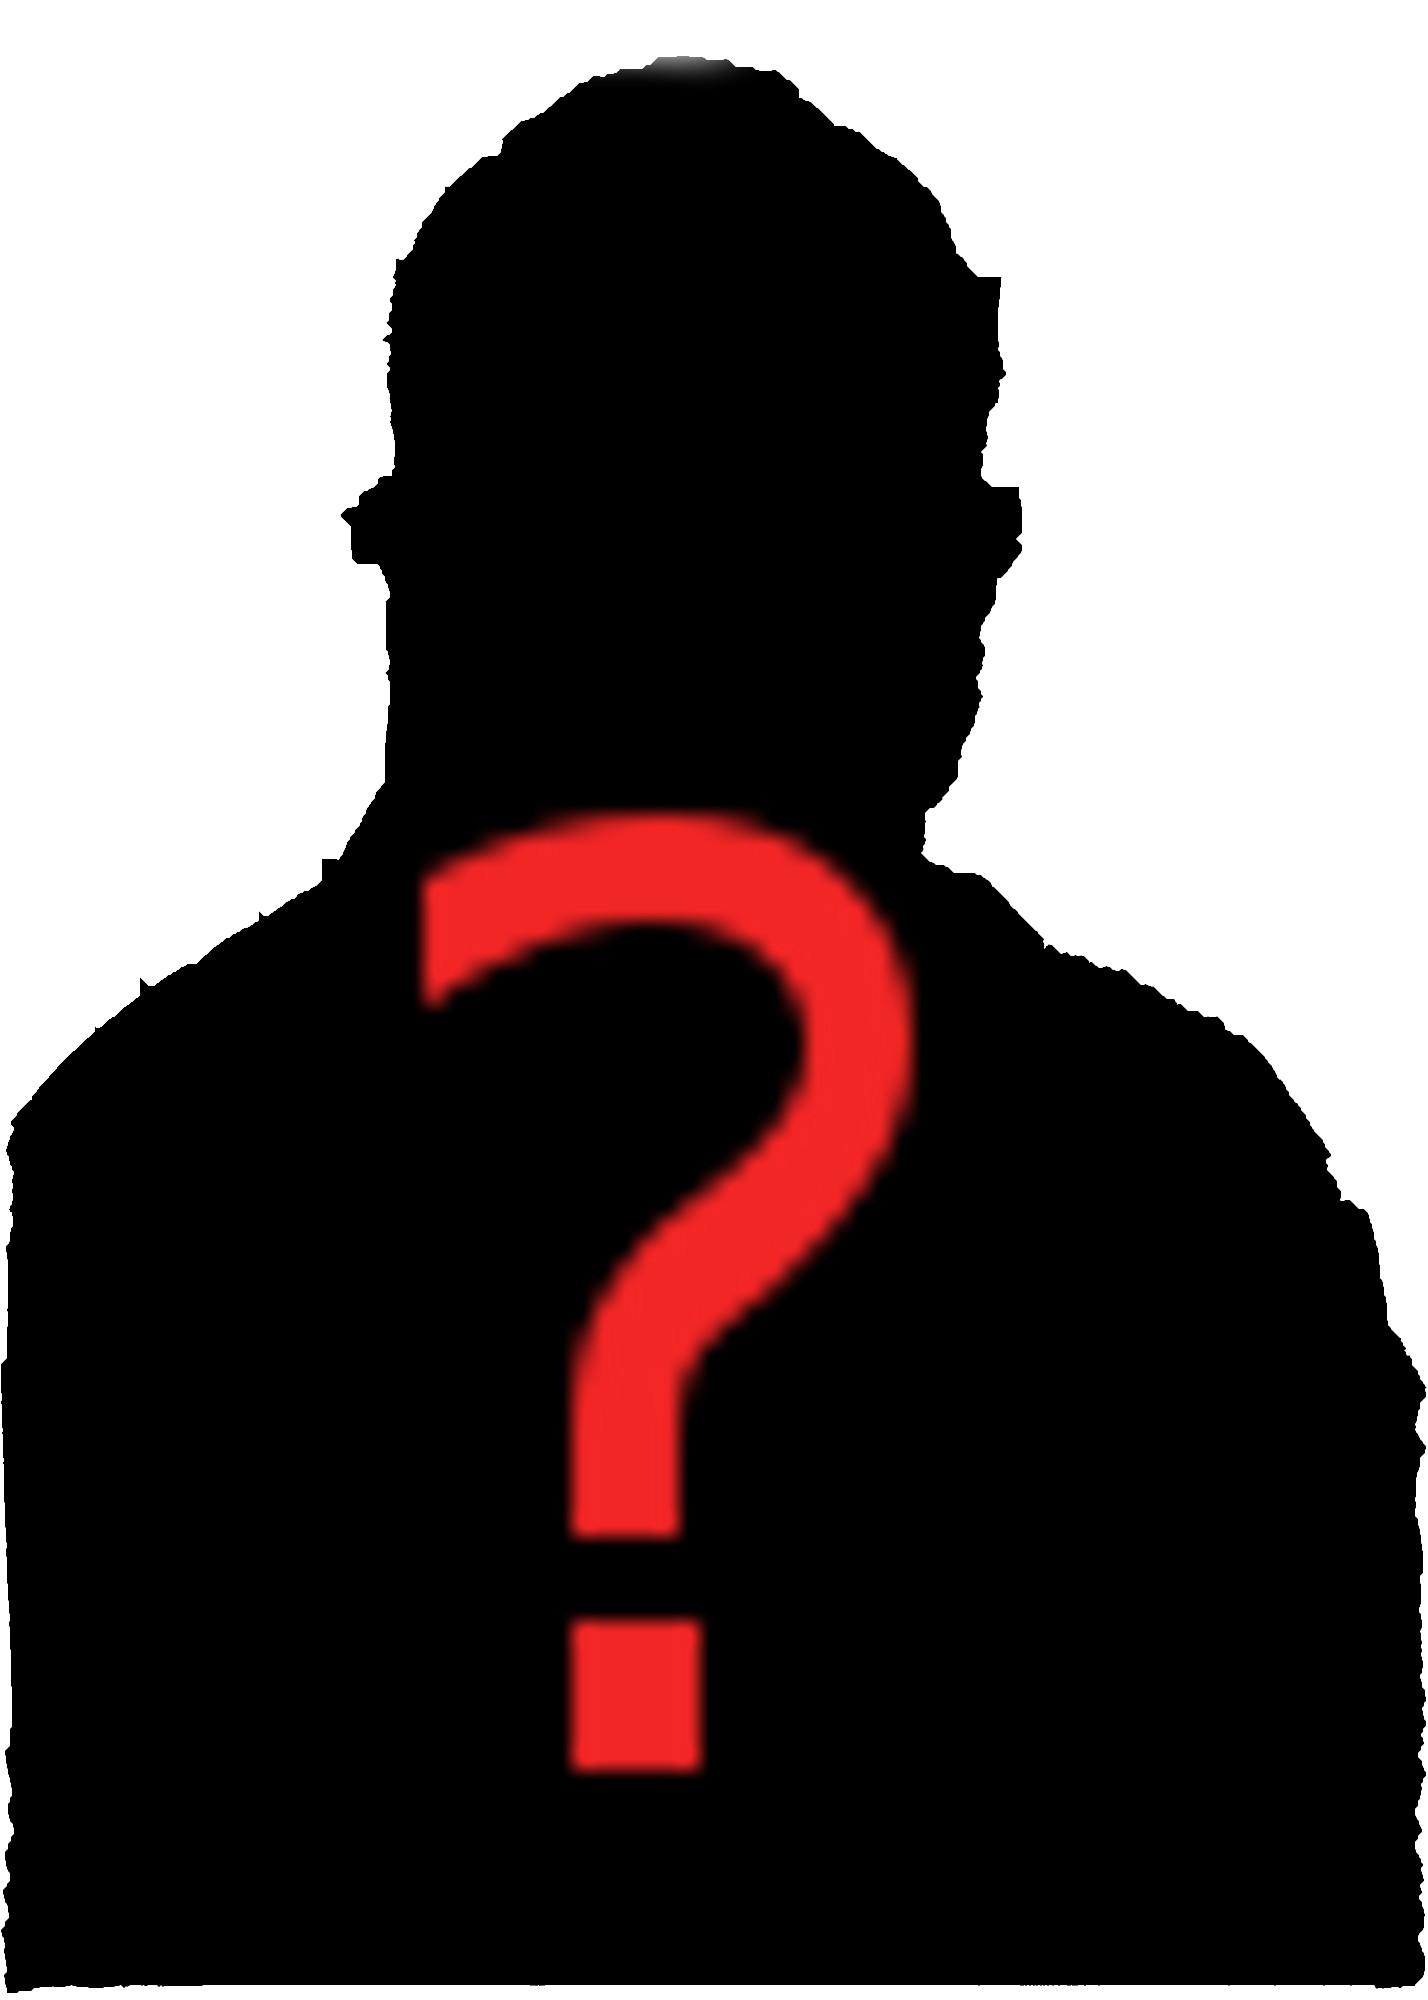 Jack A. Ori, MSW - Who Am I?